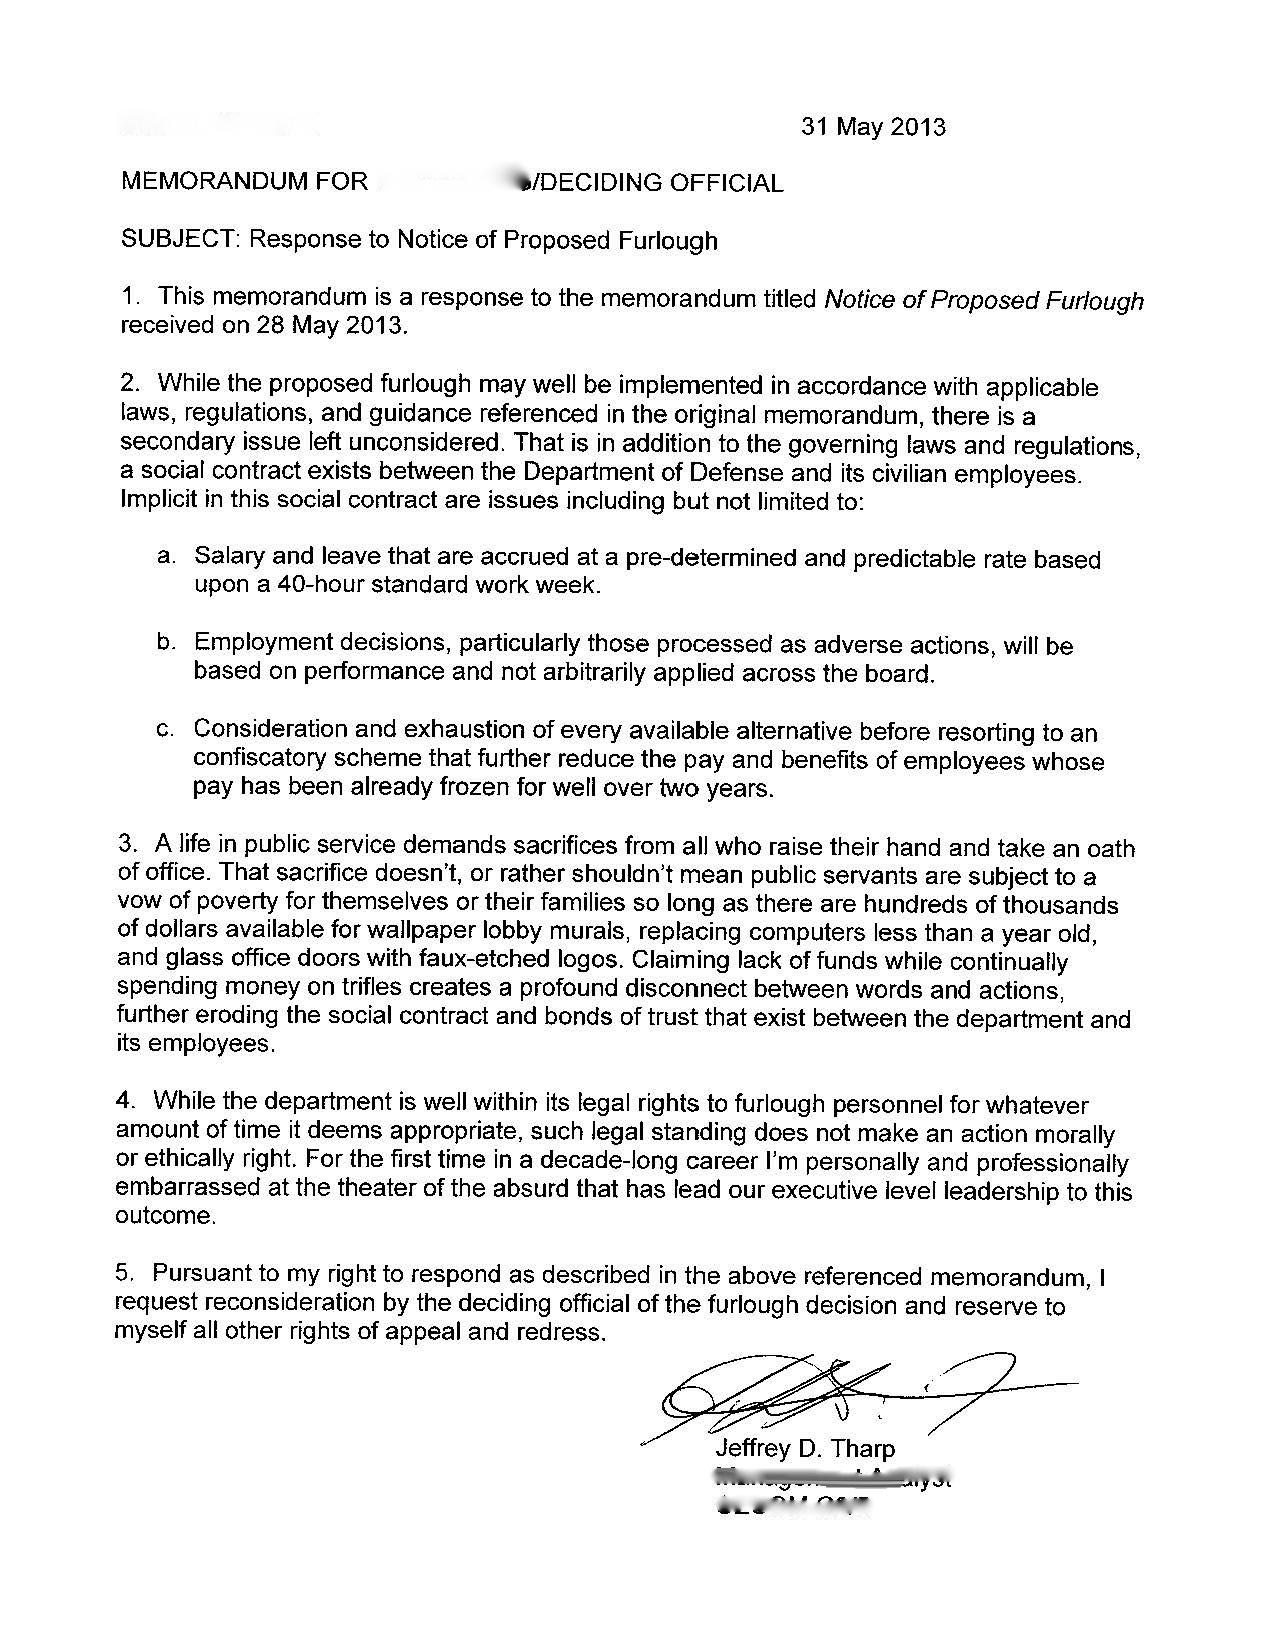 Response to Furlough Memo